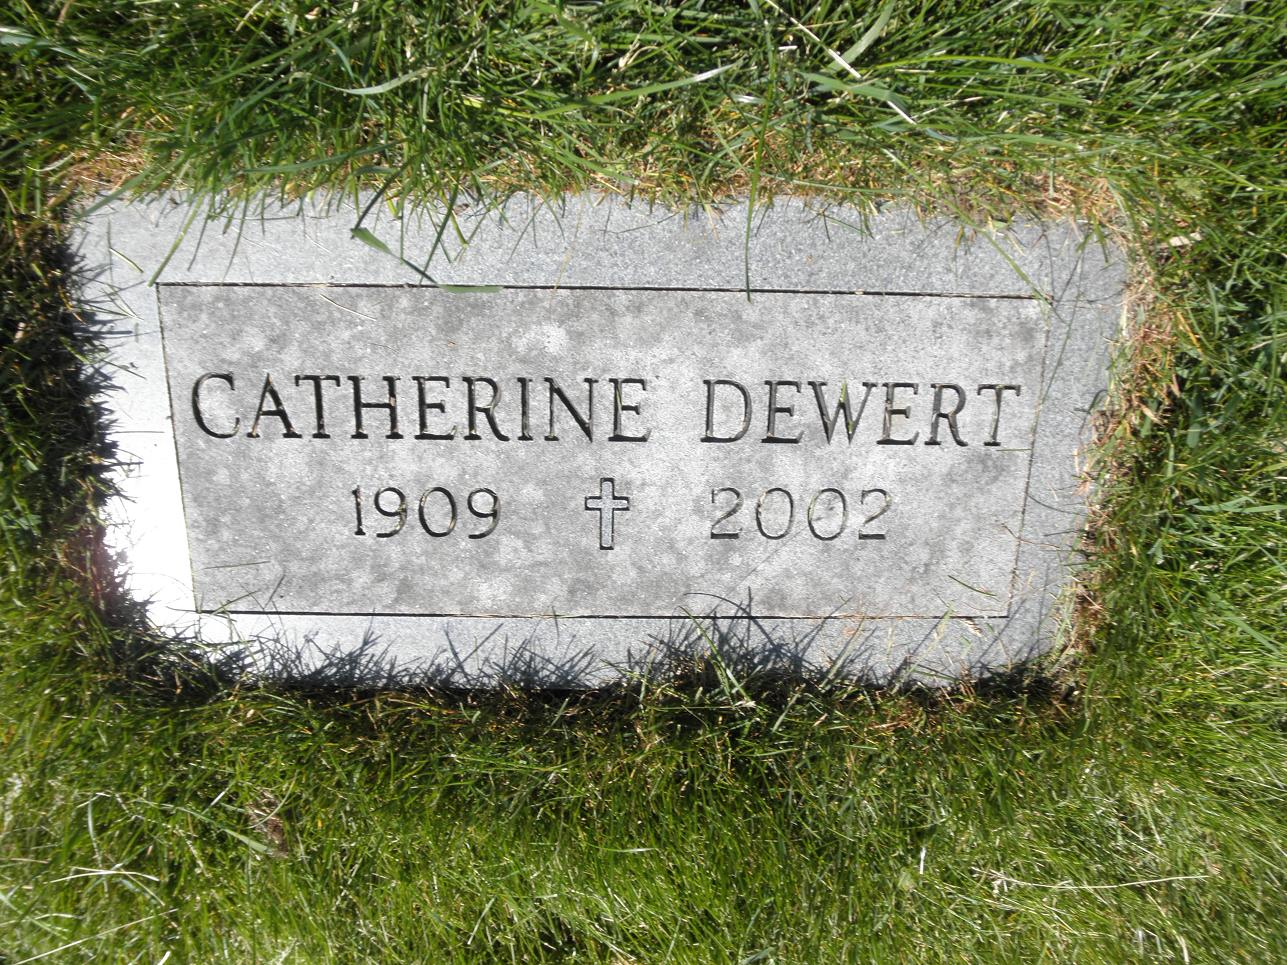 Catherine Dewert